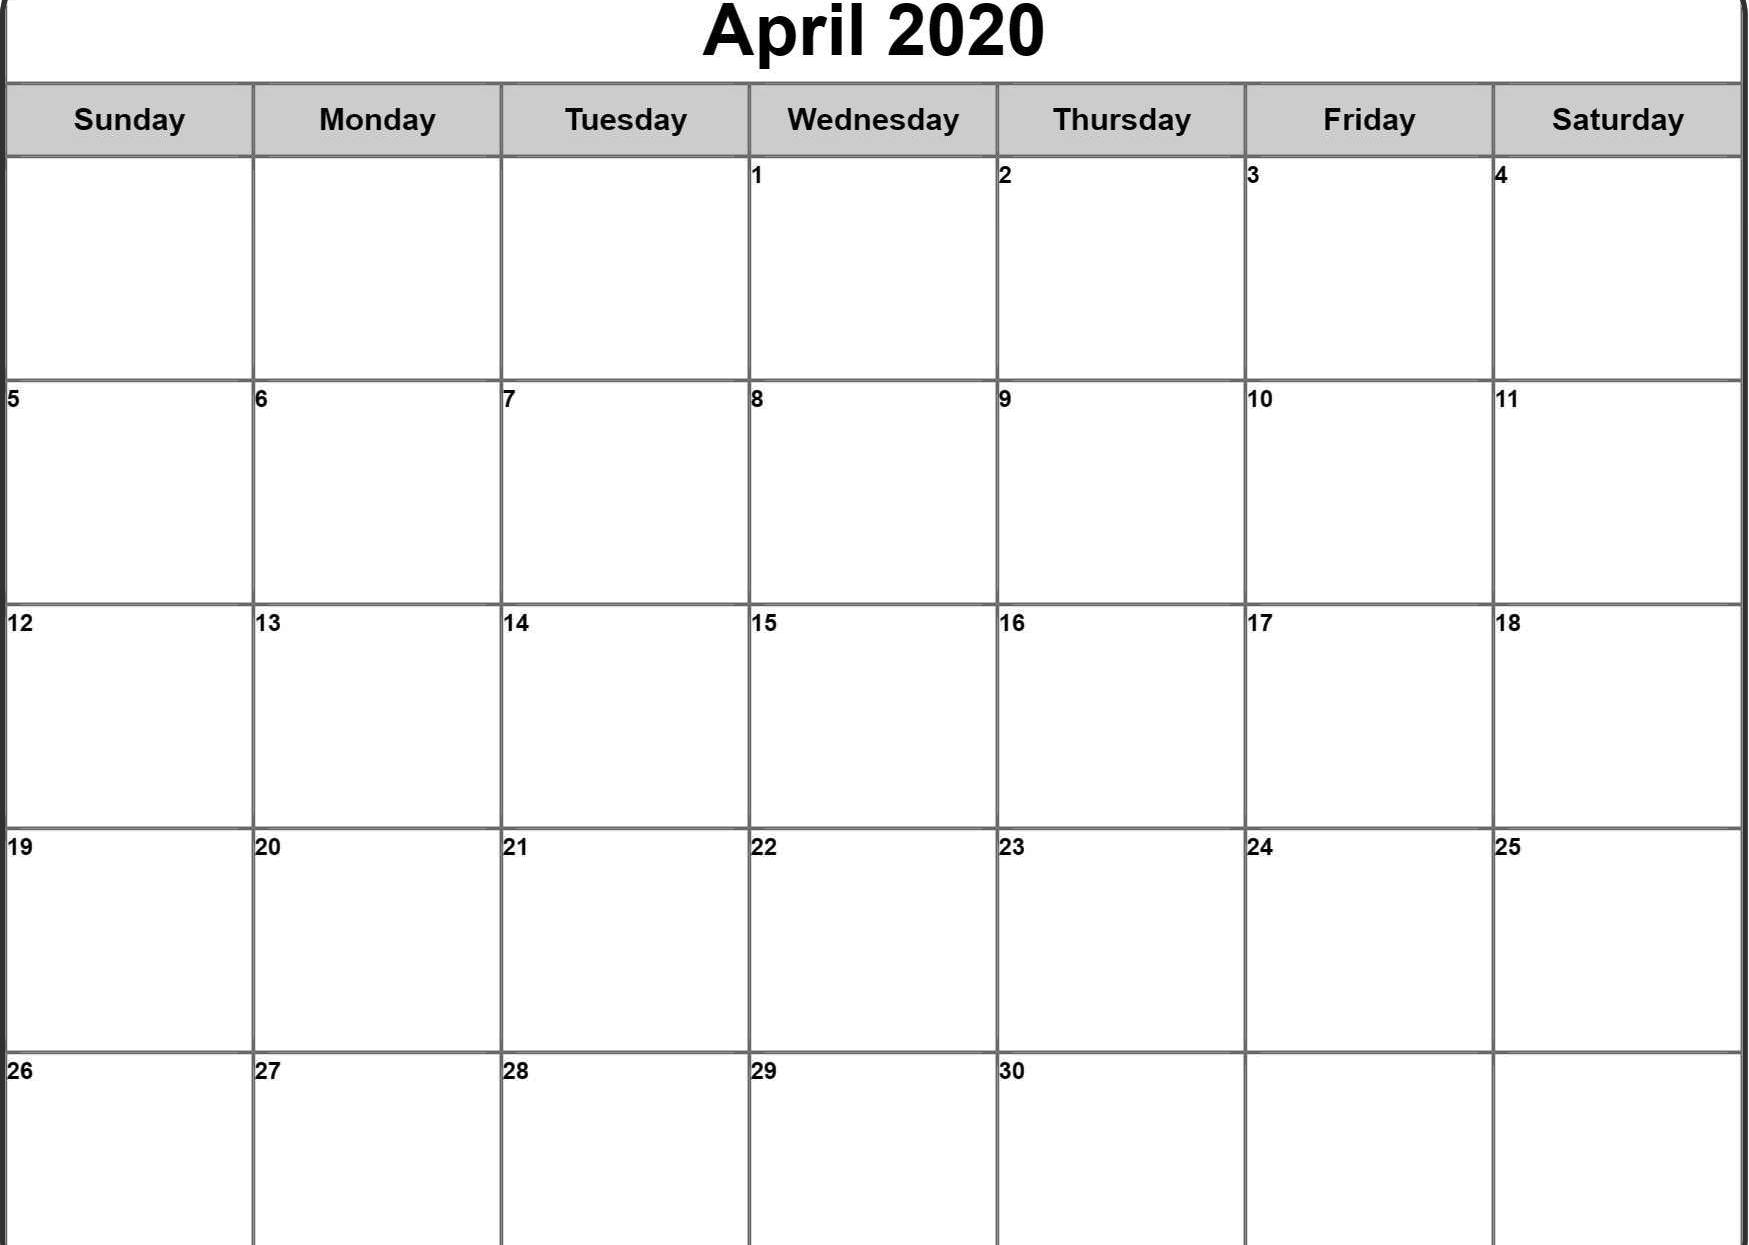 April Printable Calendar 2020.April 2020 Calendar Printable Blank Template Pdf Word Excel